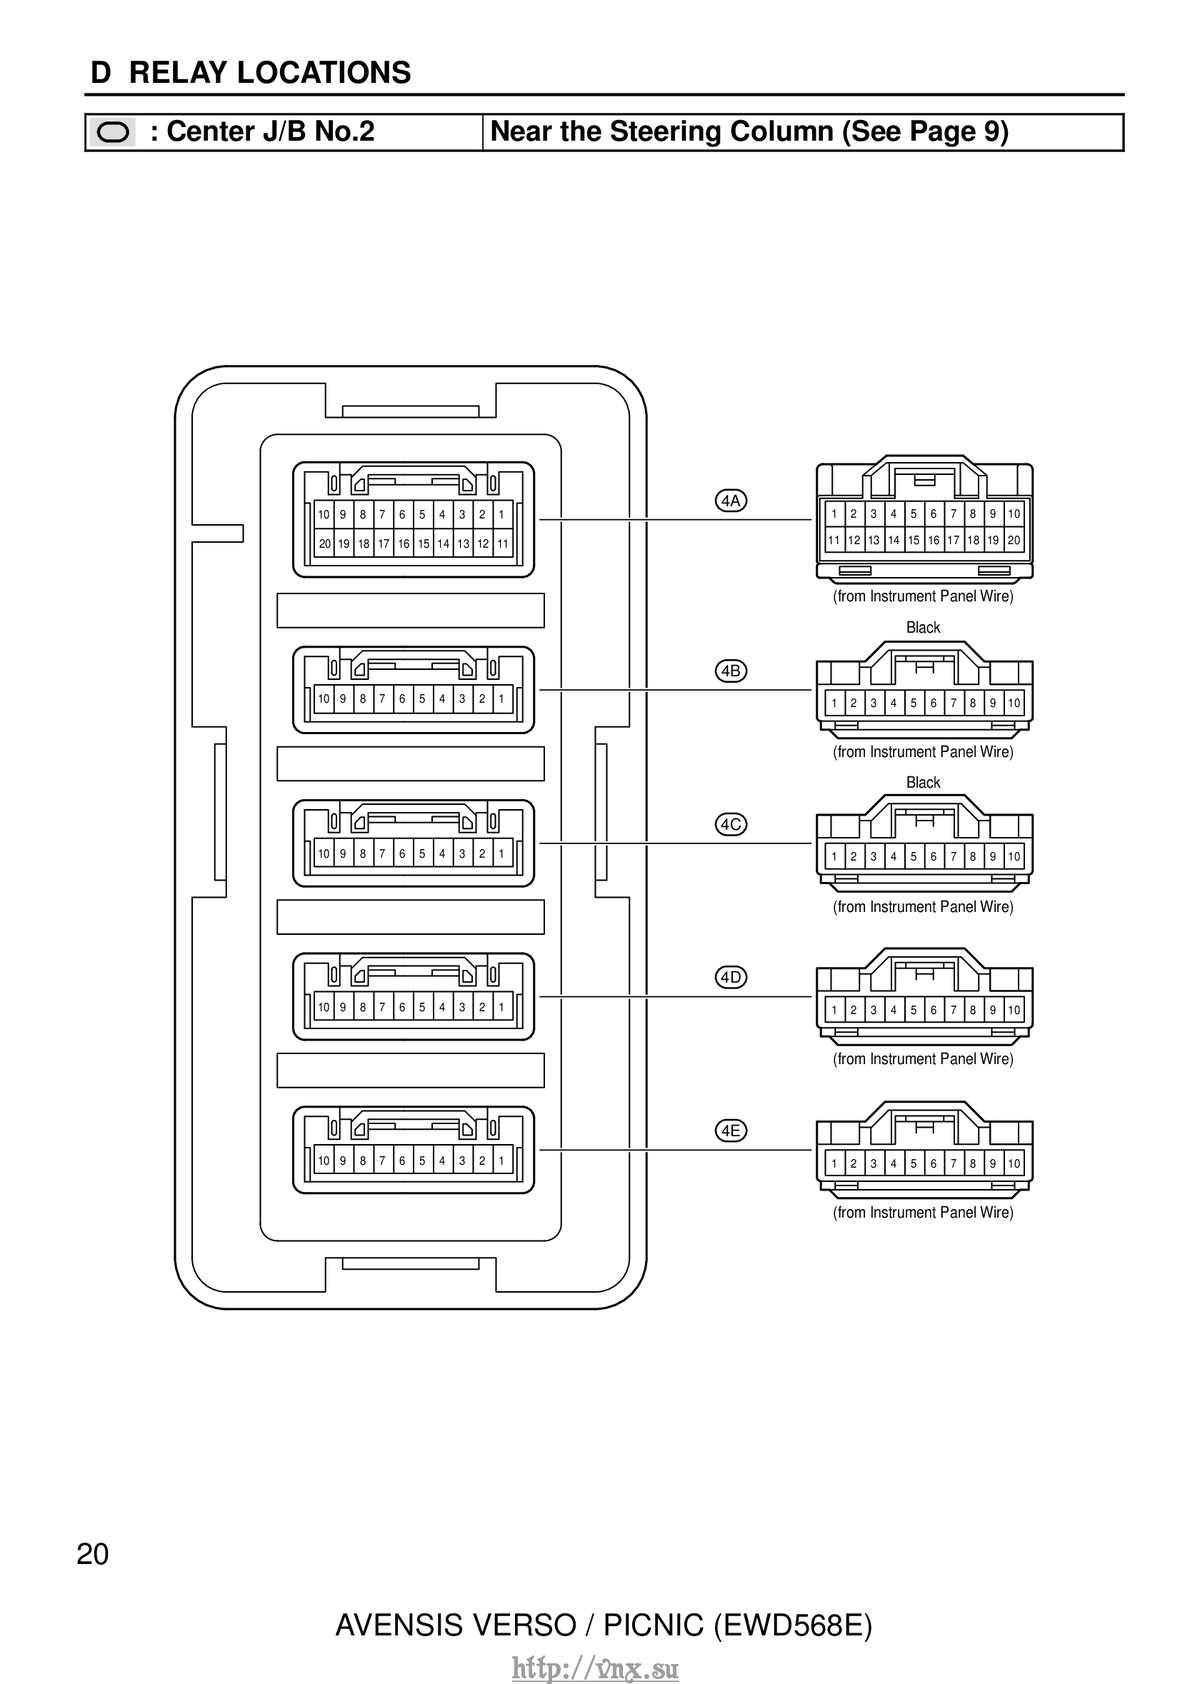 Vnxsu Avensis Verso Picnic Ewd 568e 450e 1 Calameo Downloader P25 Wiring Diagram Page 25